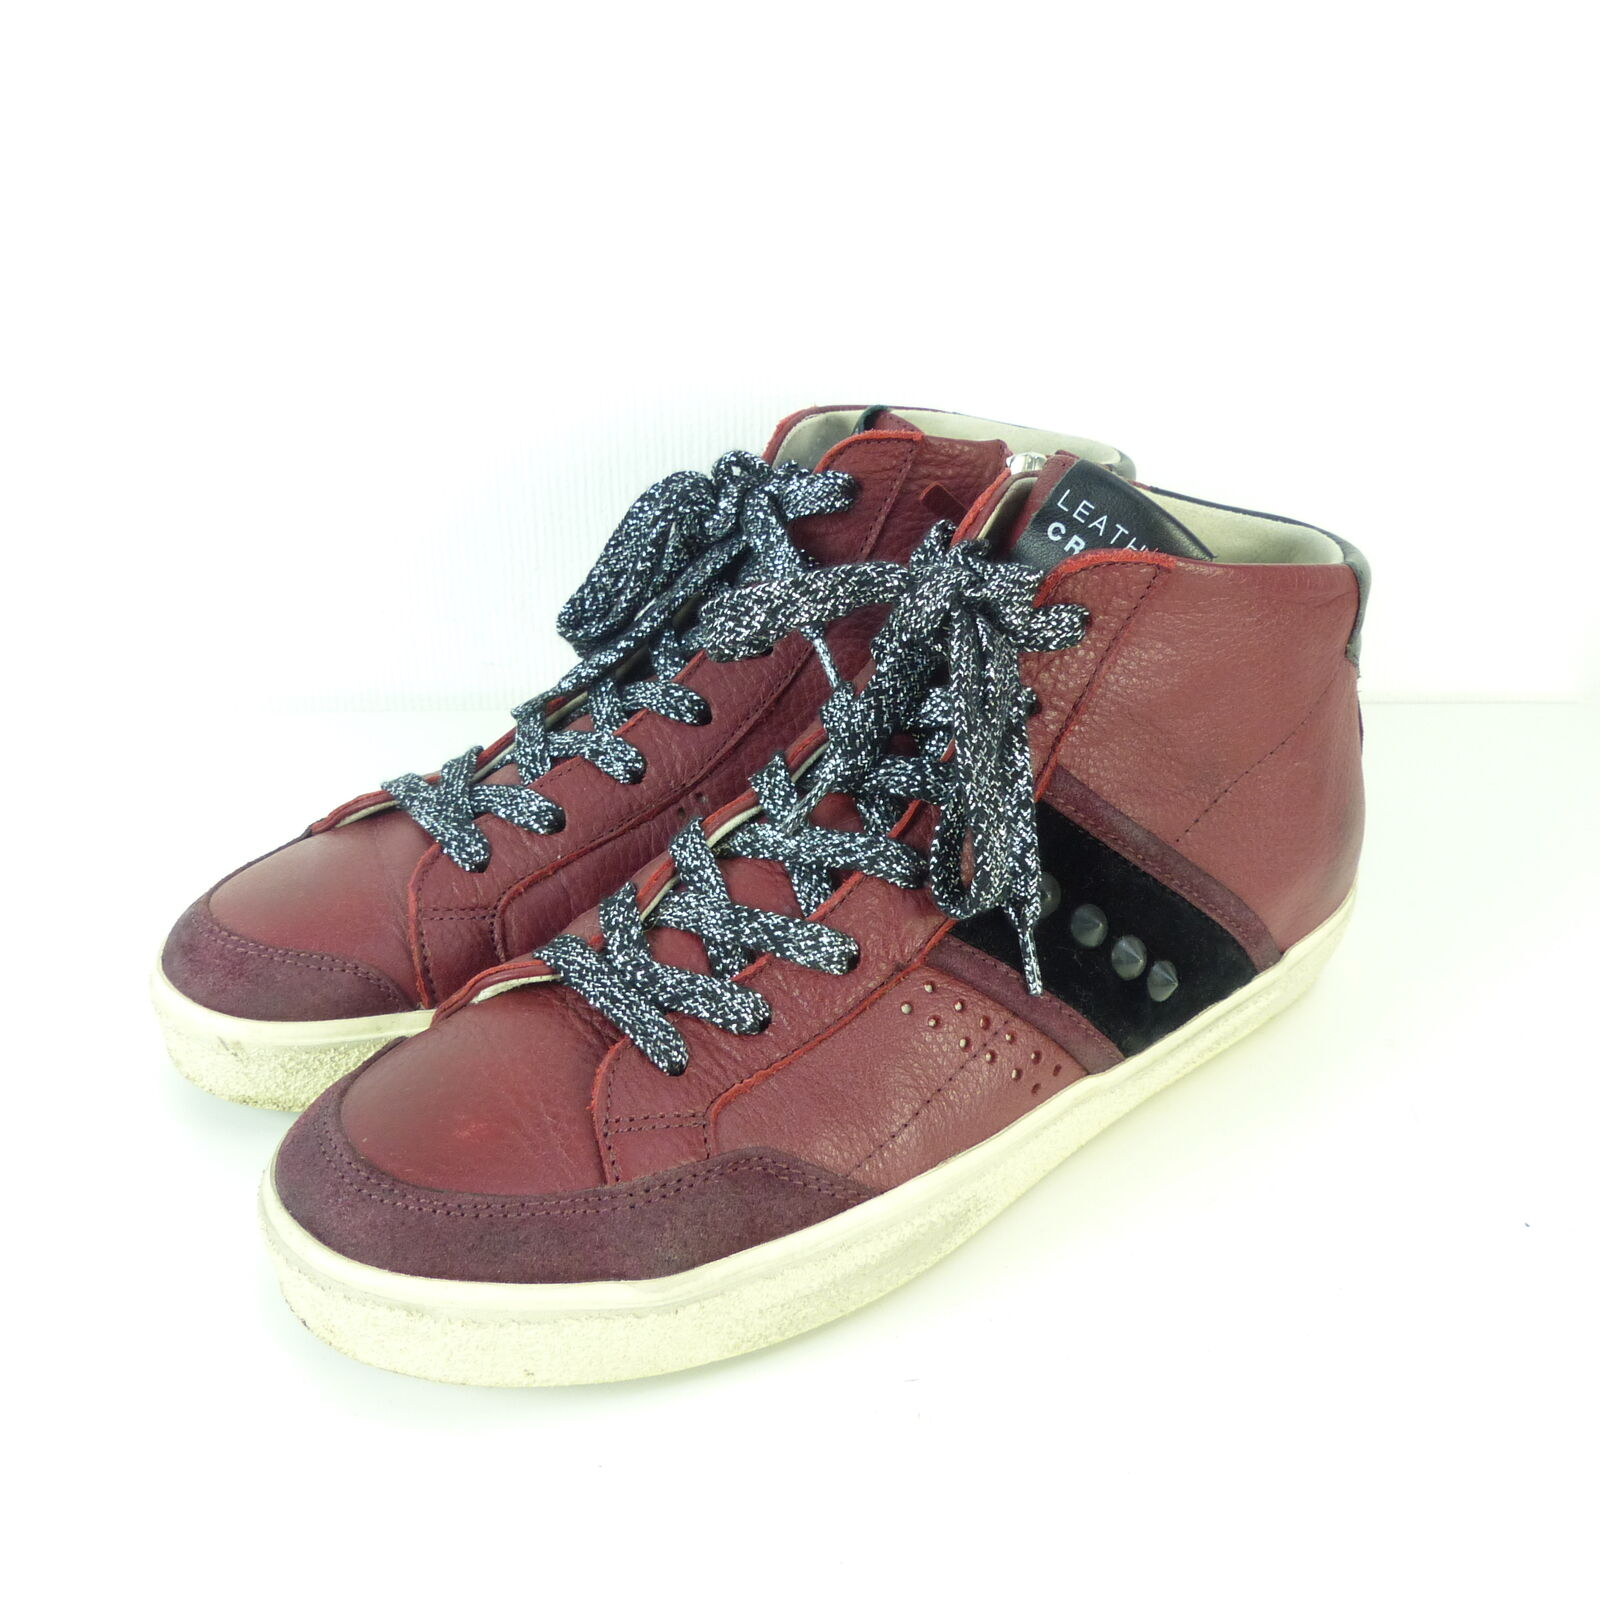 LEATHER CROWN Sneaker High Top Nieten Leder Rot Schwarz Gr. EUR 39 (H59)